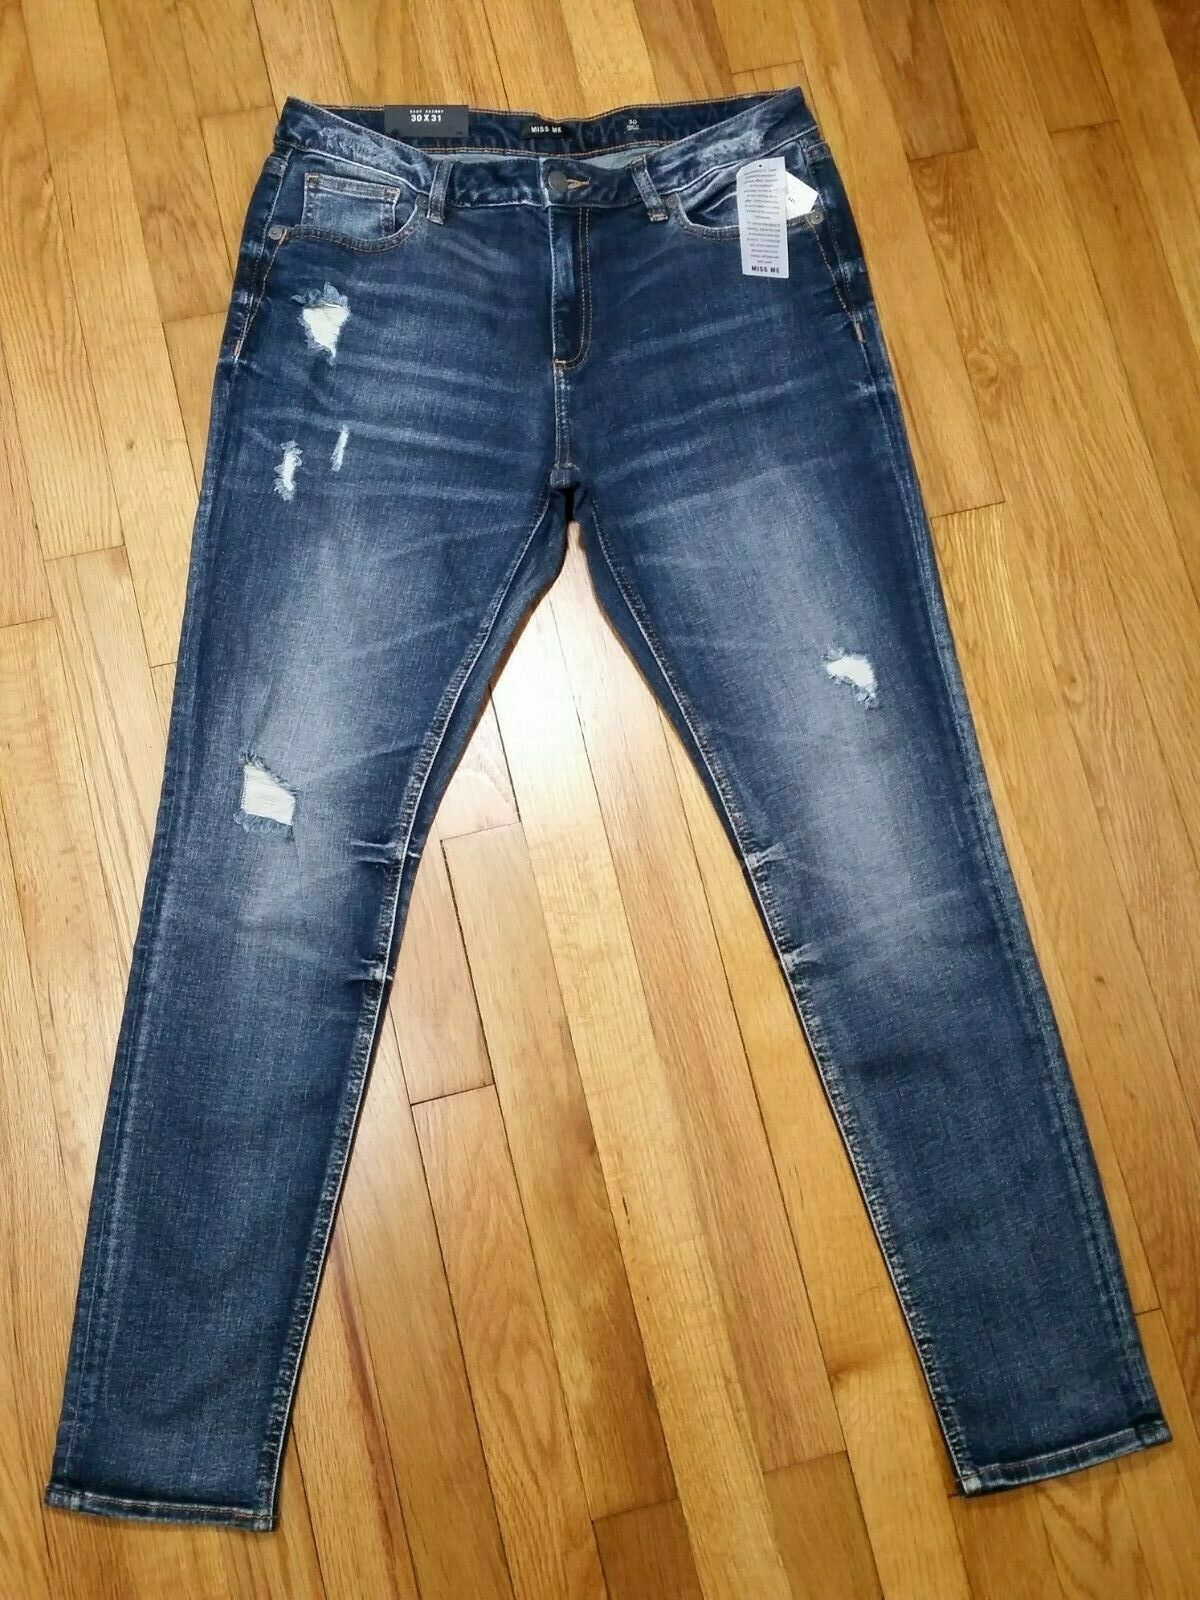 Miss Me Easy Skinny Jeans Distressed Ripped Medium Wash Mid Rise B1002ES7R NWT